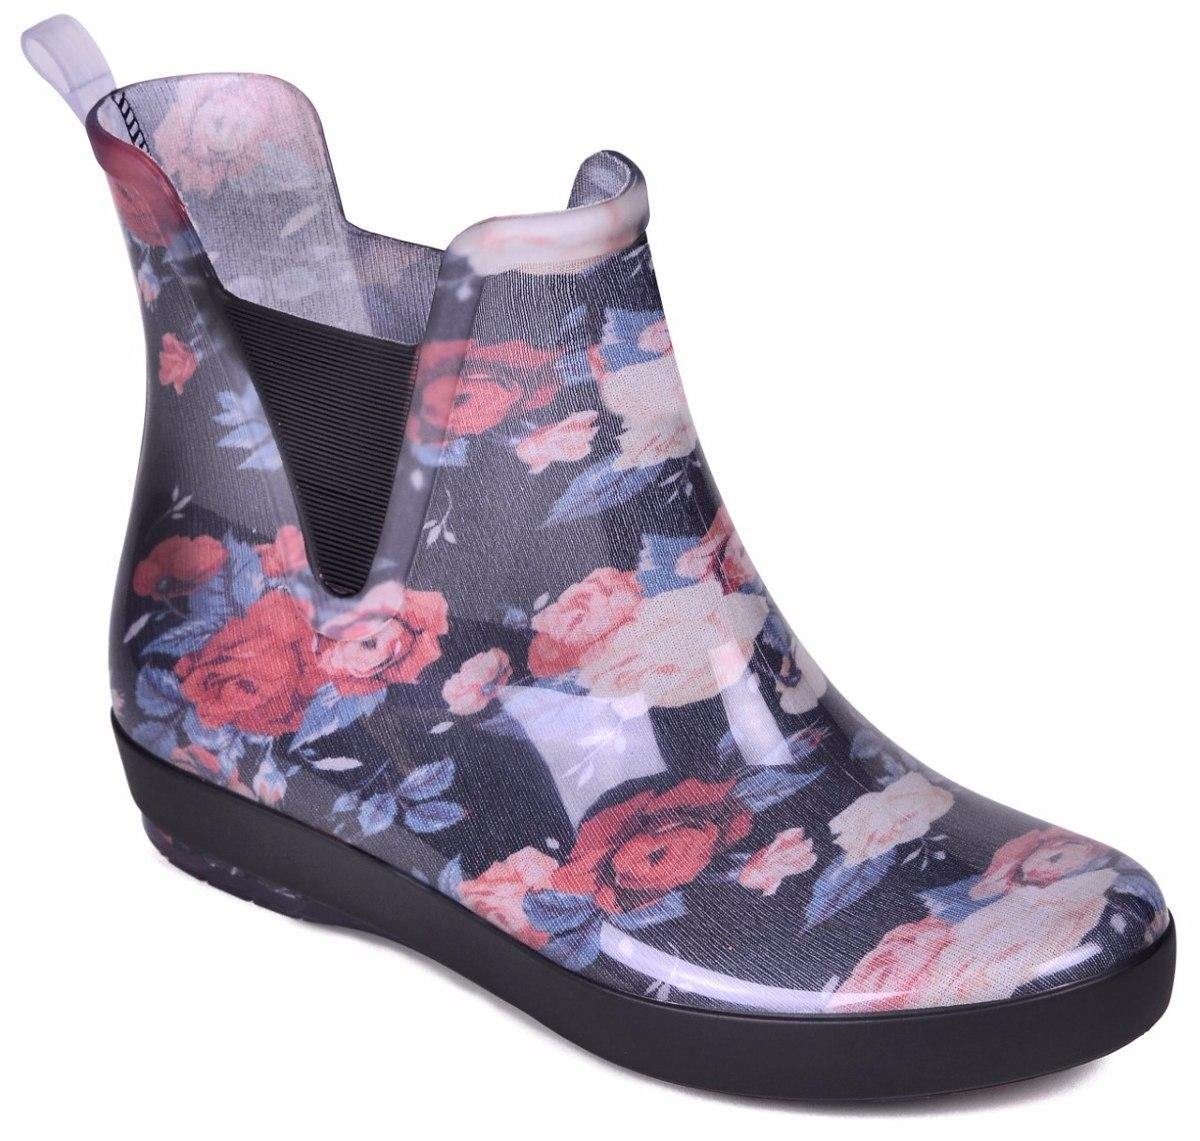 1f29435151a bota feminina galocha boa onda floral holli 1702-202. Carregando zoom.